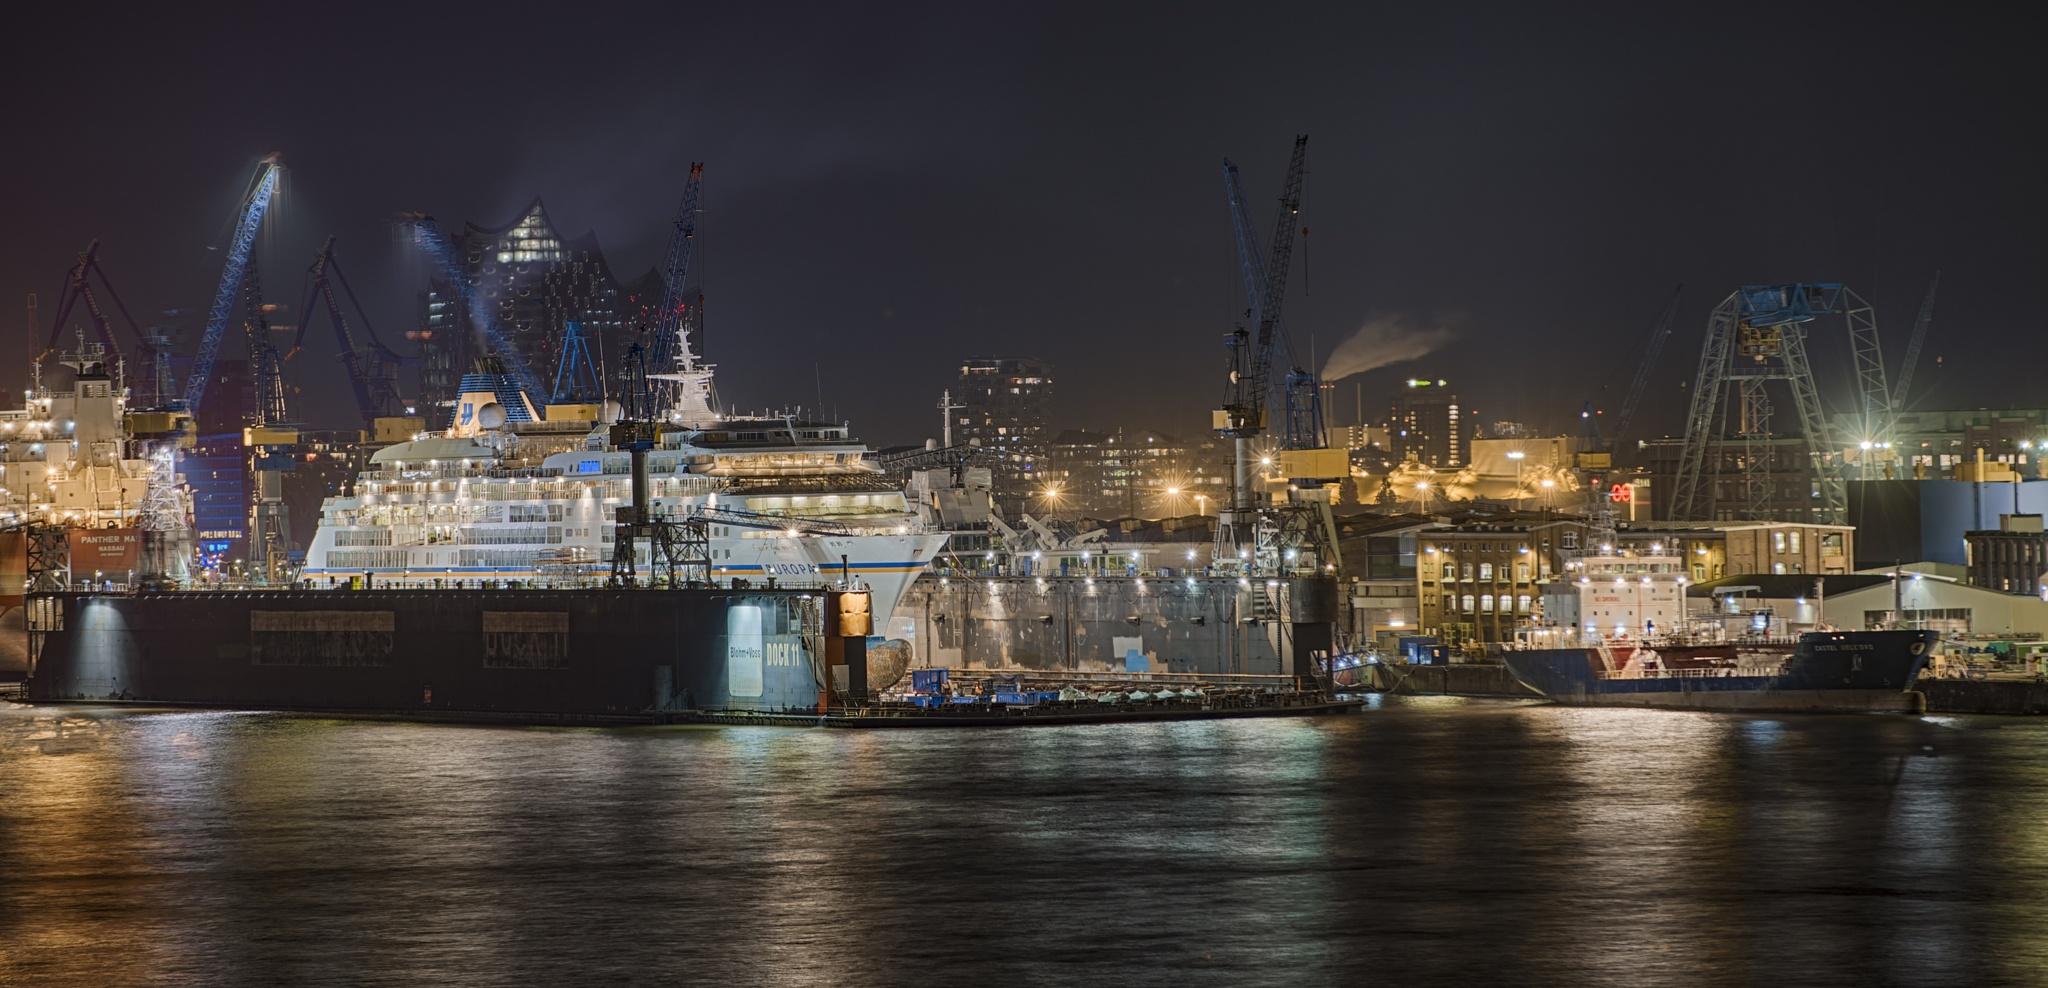 Die Europa im Dock in Hamburg by marcuswinkelhake